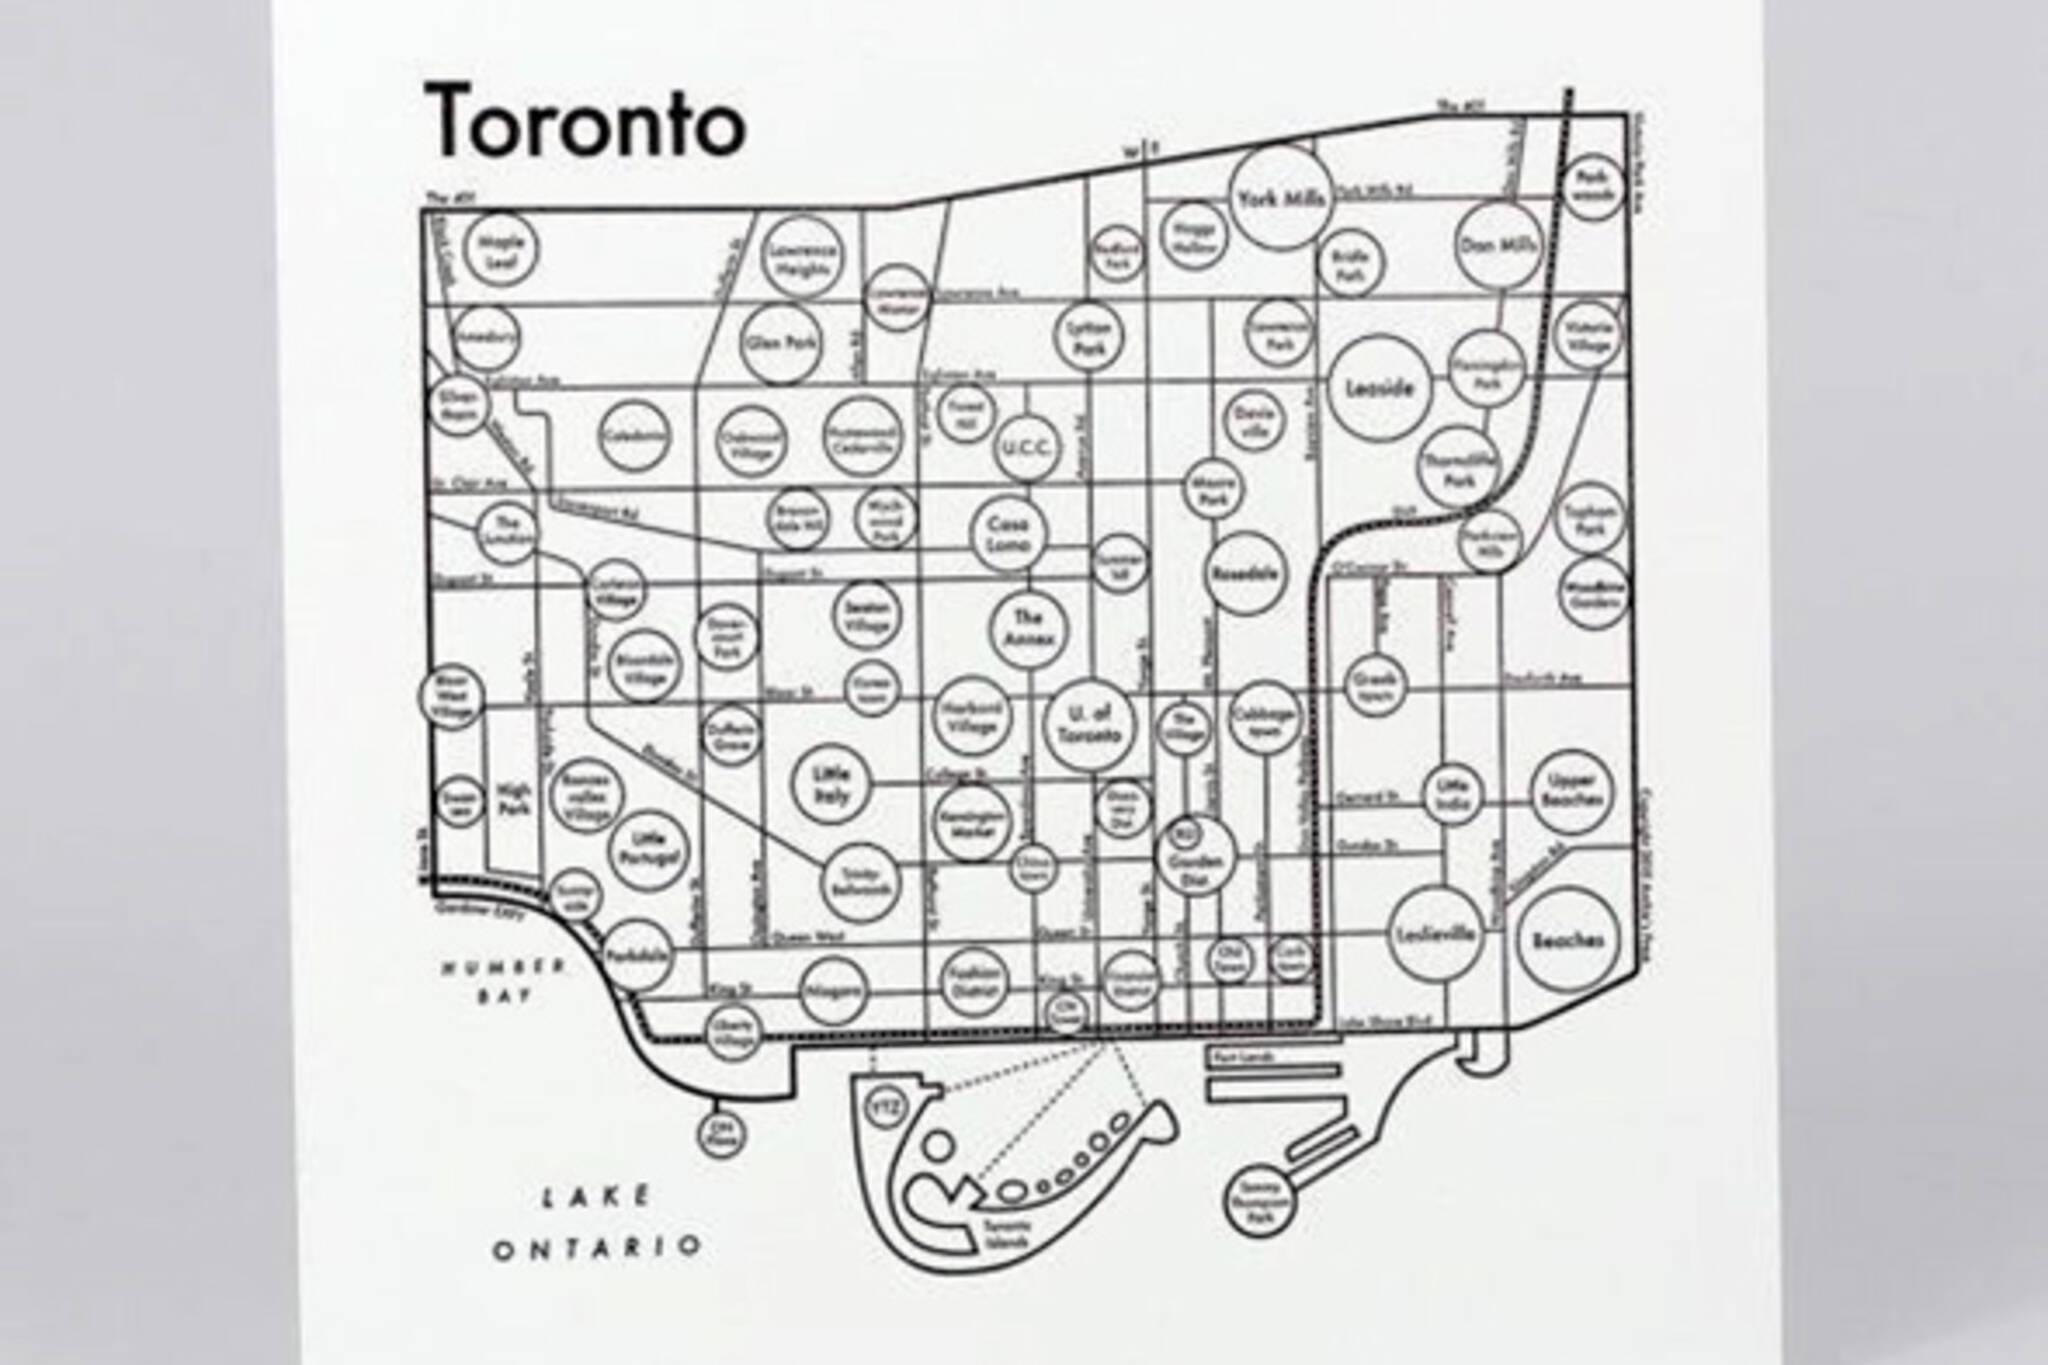 toronto mind map